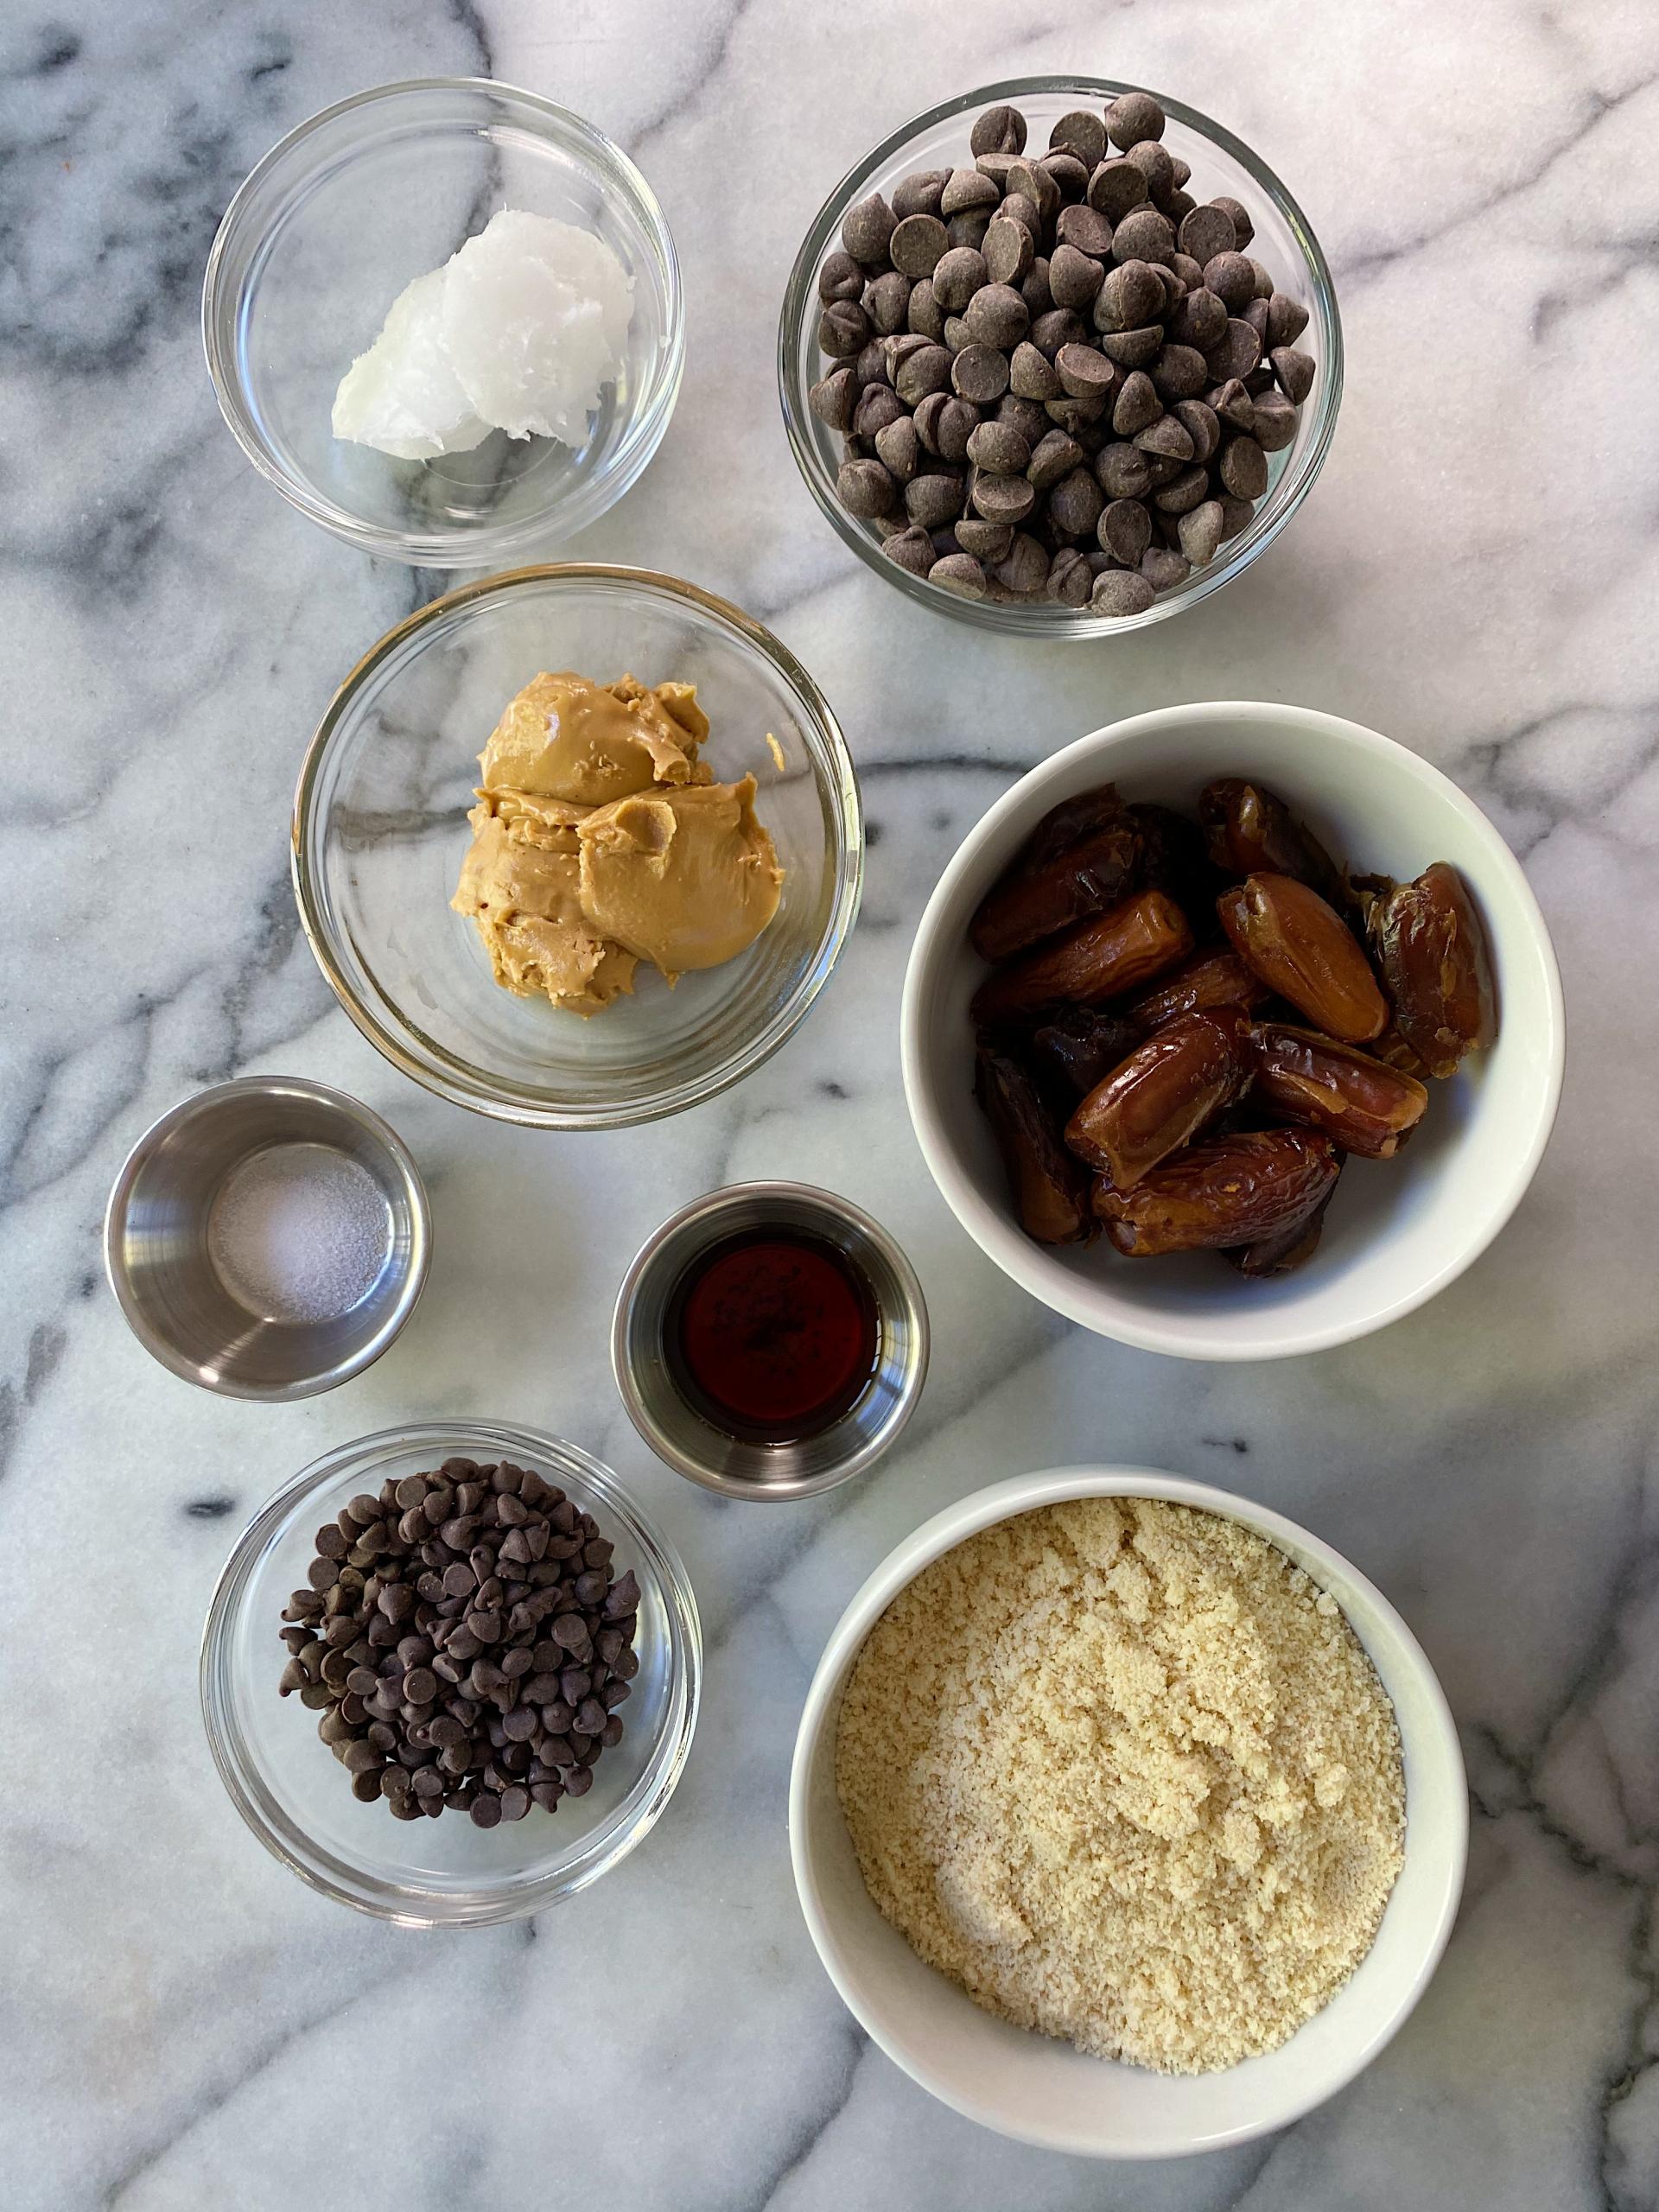 No Bake Cookie Dough Truffles easy recipe gluten-free www.healthygfffamily.com